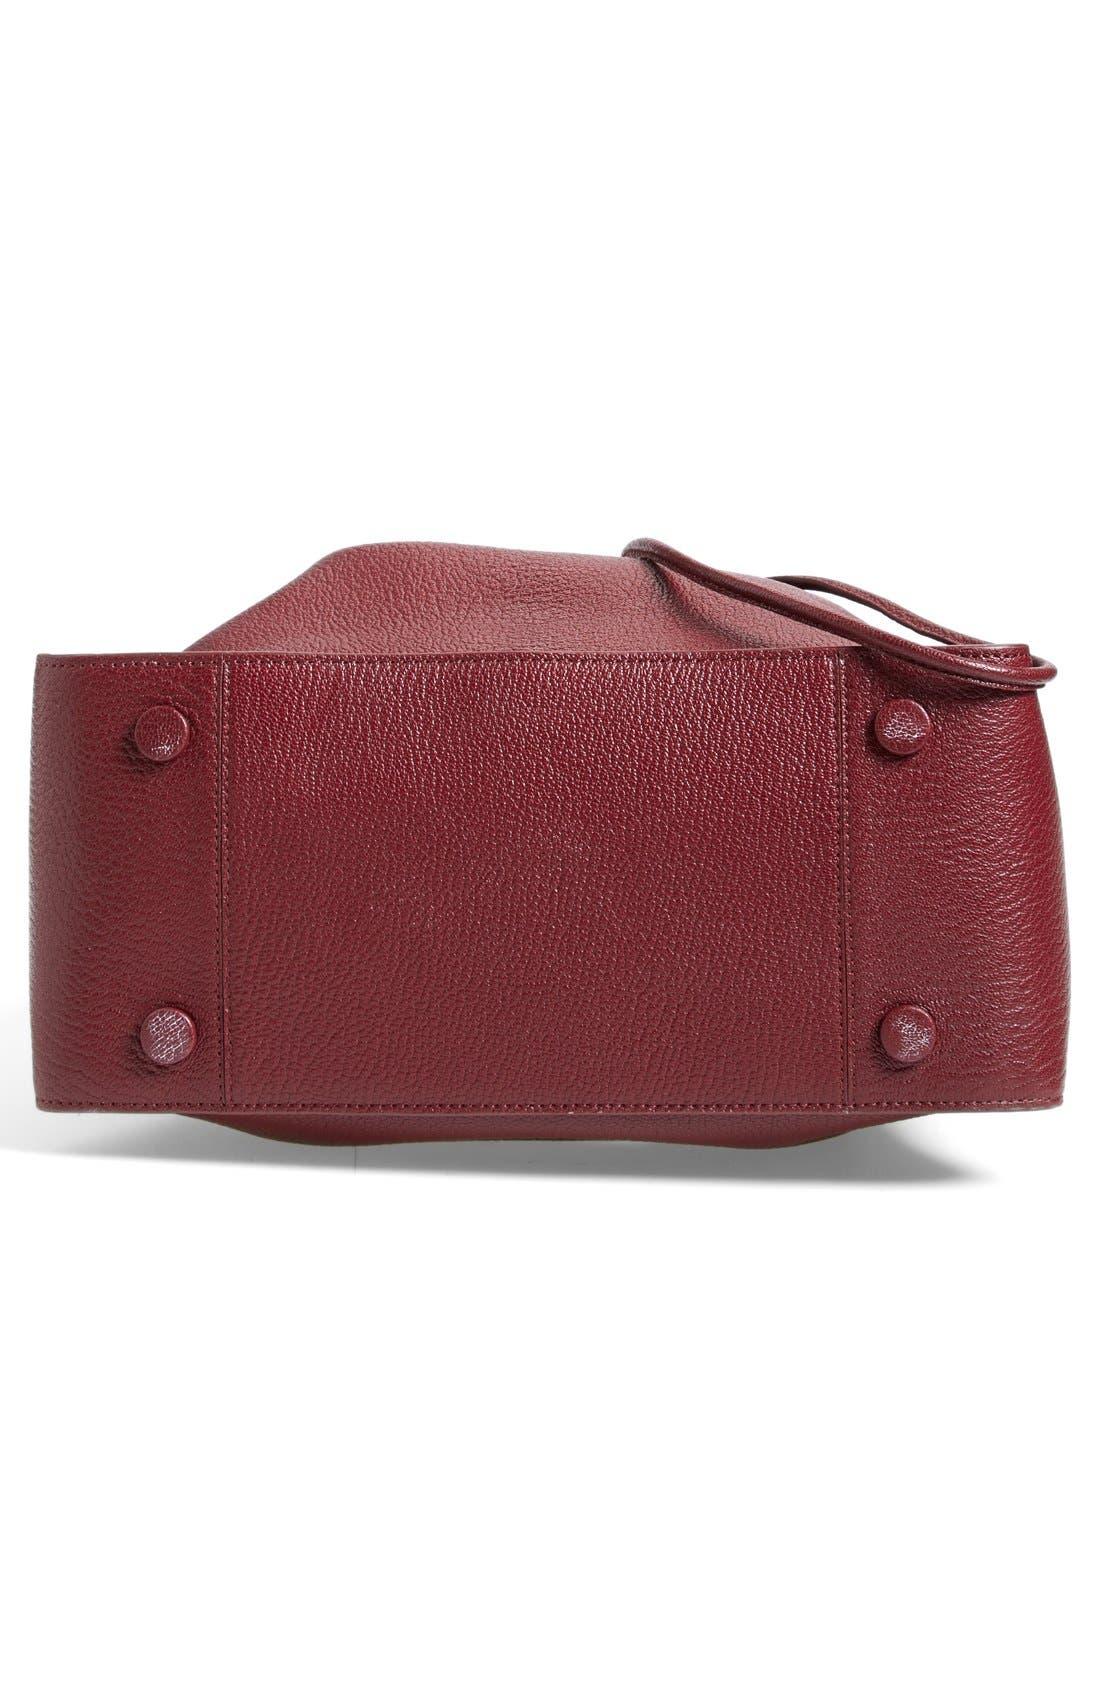 'Large Soleil' Leather Bucket Bag,                             Alternate thumbnail 8, color,